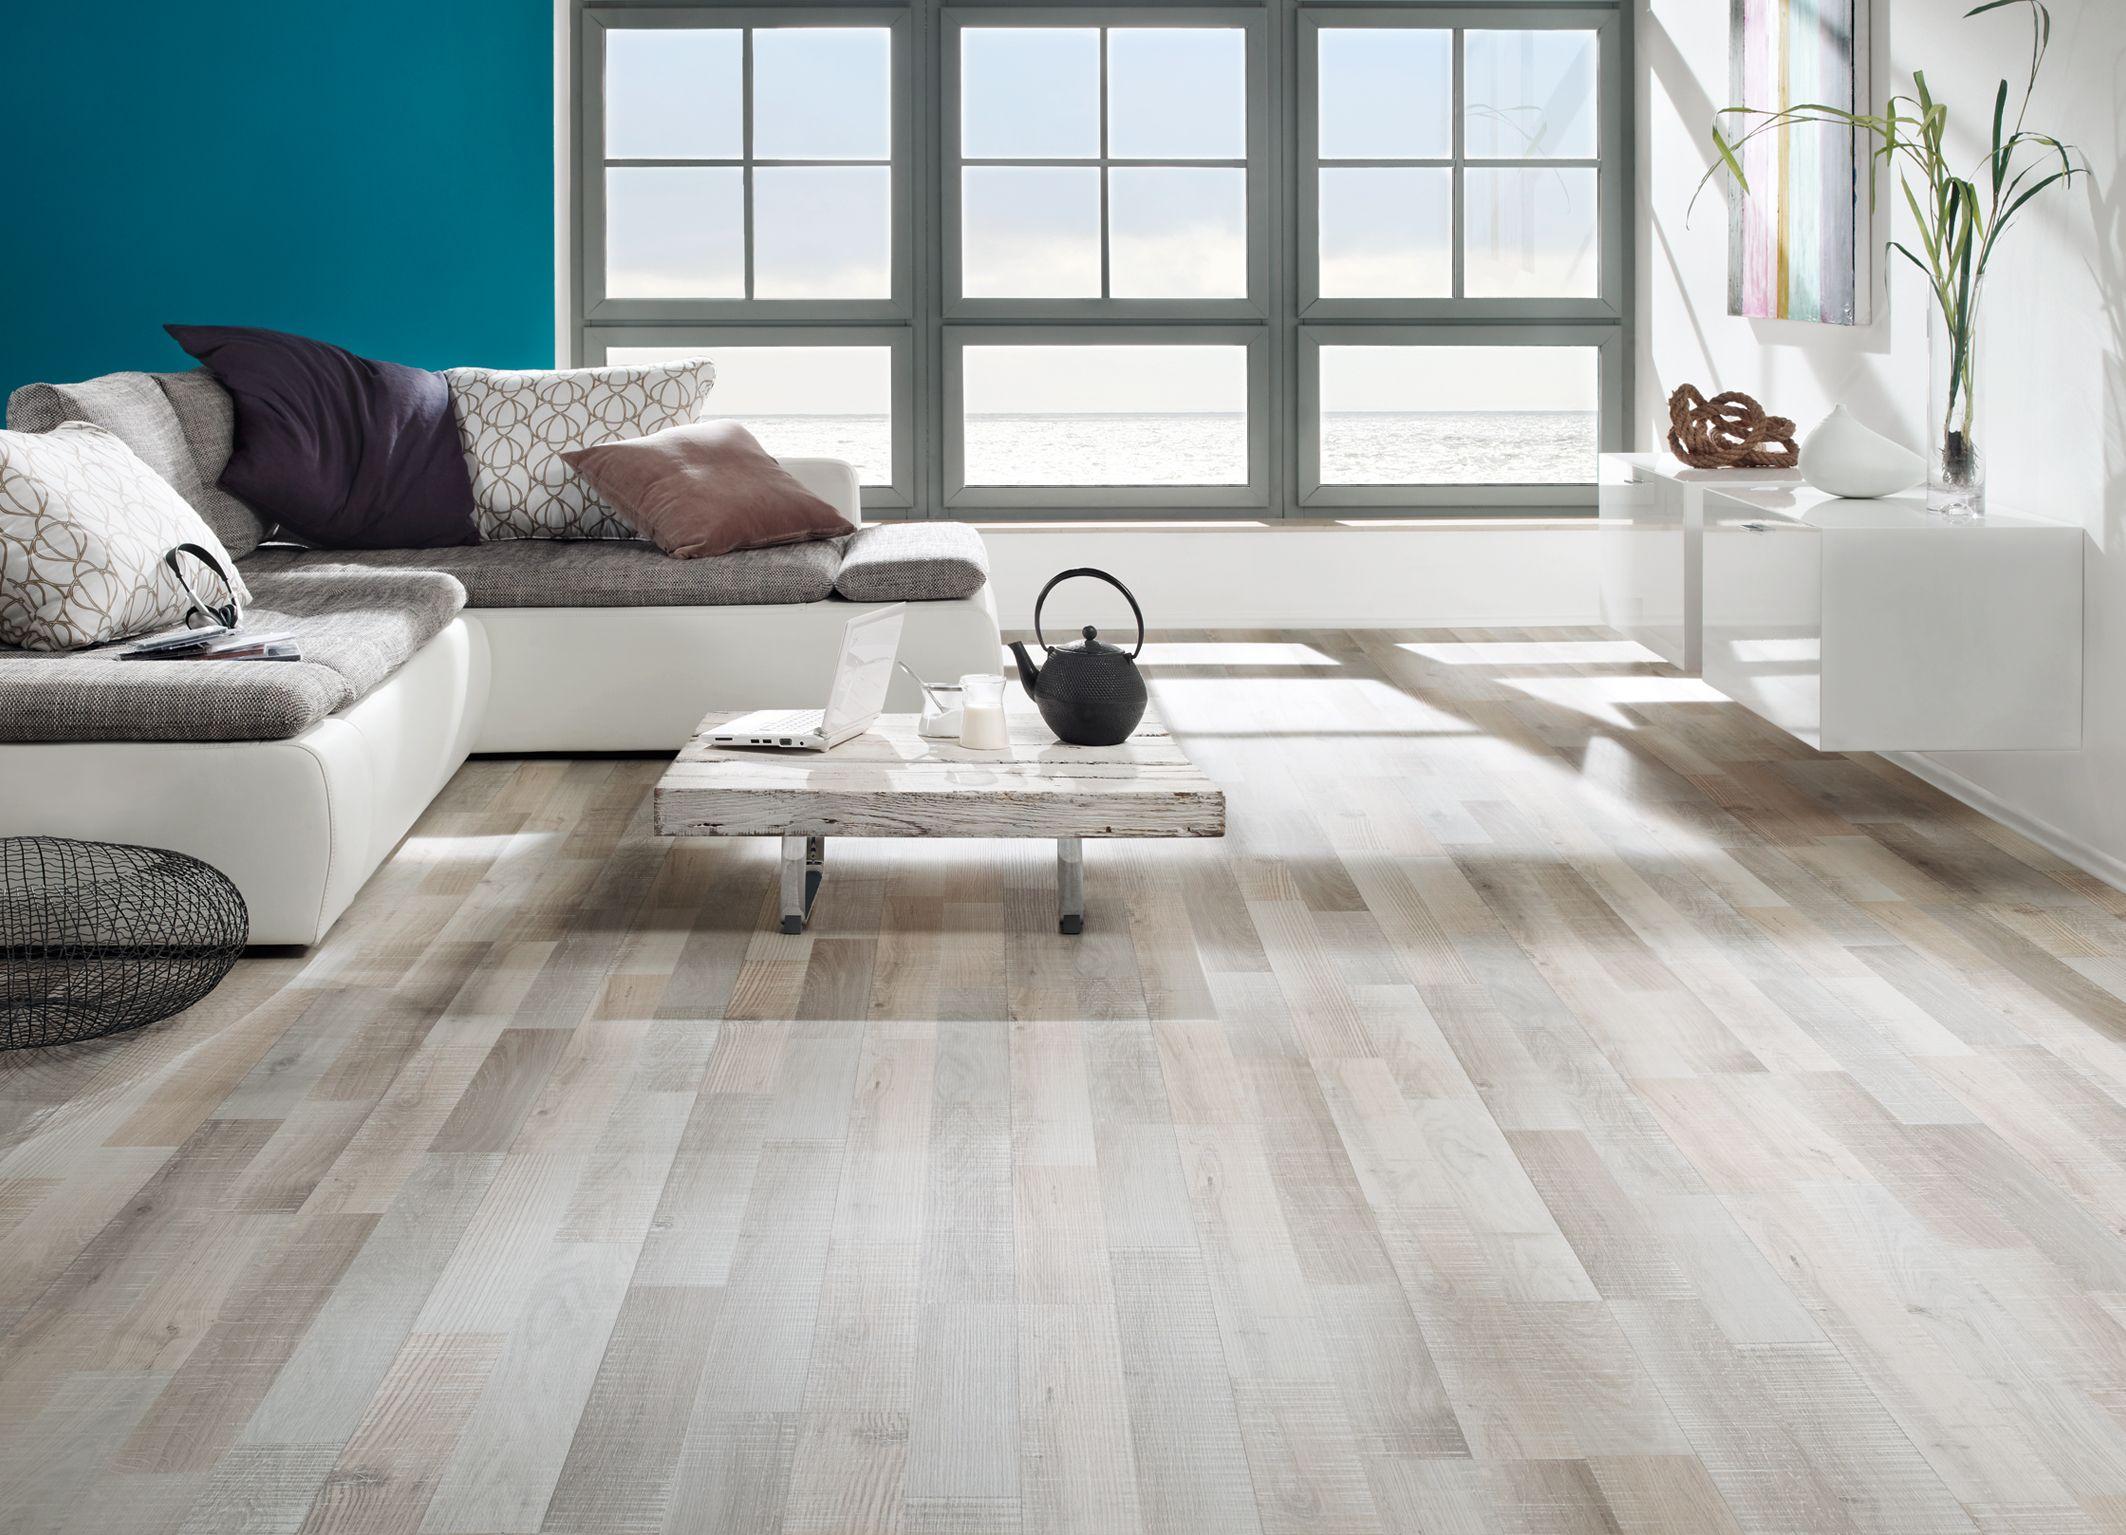 Eiken ruw gezaagd grijs wit laminaat vloer vloeren pinterest